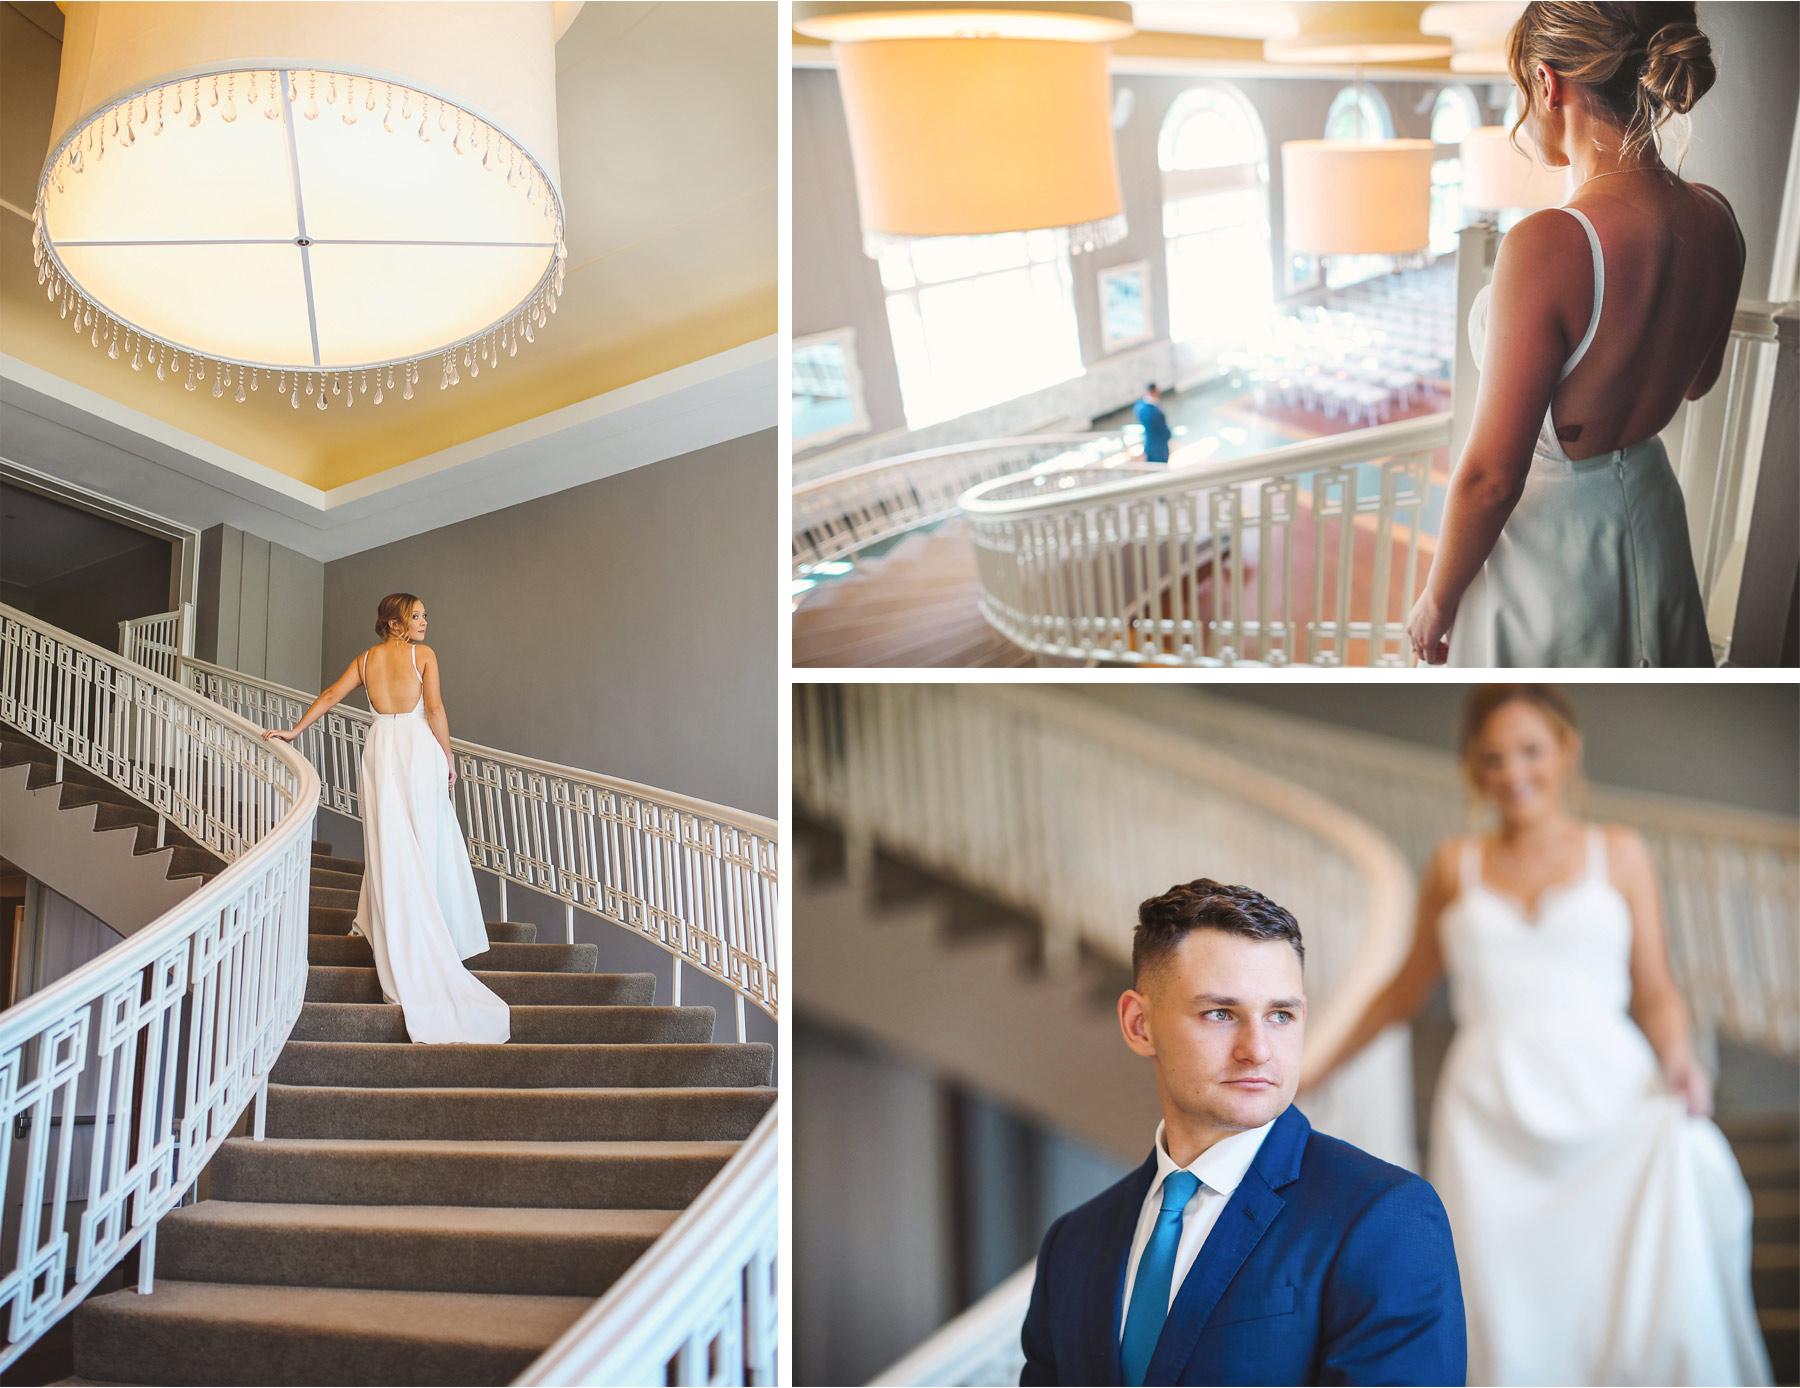 03-Minneapolis-Minnesota-Wedding-Andrew-Vick-Photography-Calhoun-Beach-Club-Bride-Groom-First-Look-Staircase-Samantha-and-Ryan.jpg